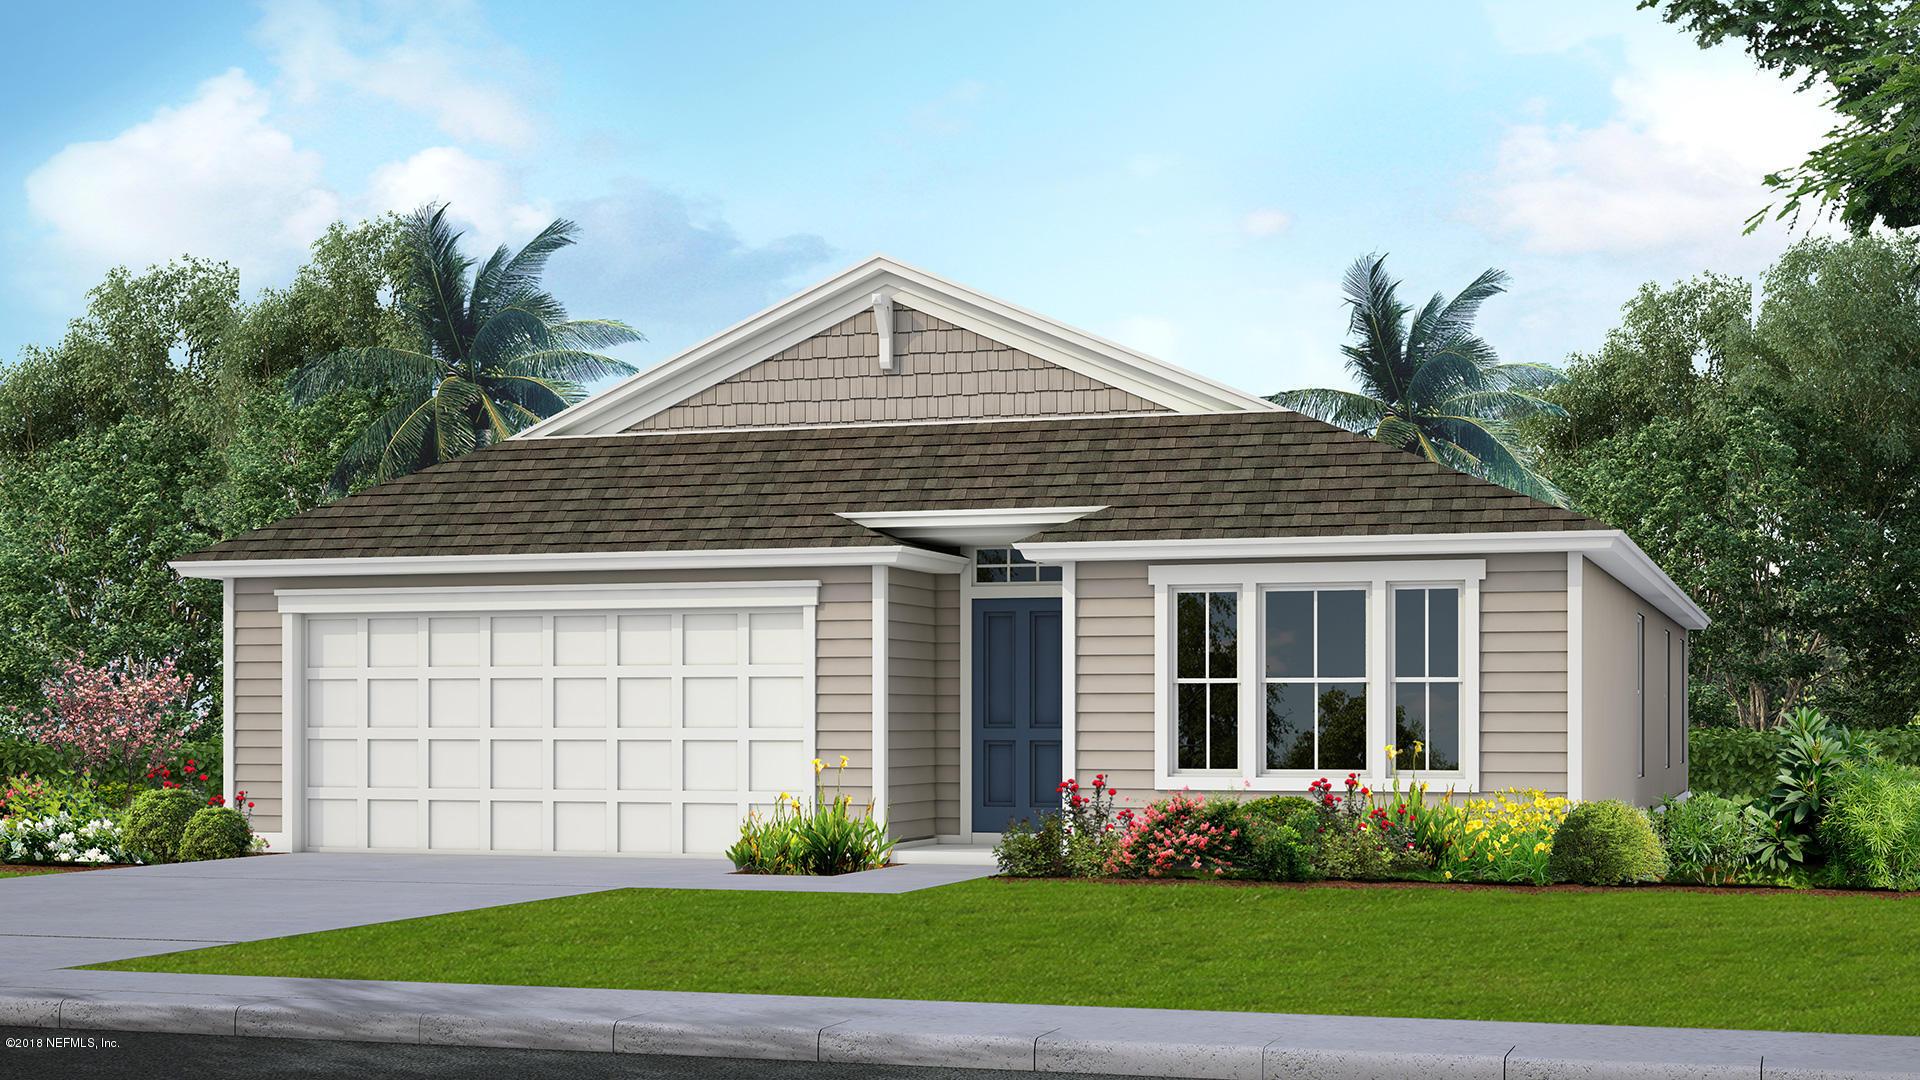 313 PONDEROSA, JACKSONVILLE, FLORIDA 32218, 4 Bedrooms Bedrooms, ,2 BathroomsBathrooms,Residential - single family,For sale,PONDEROSA,946224